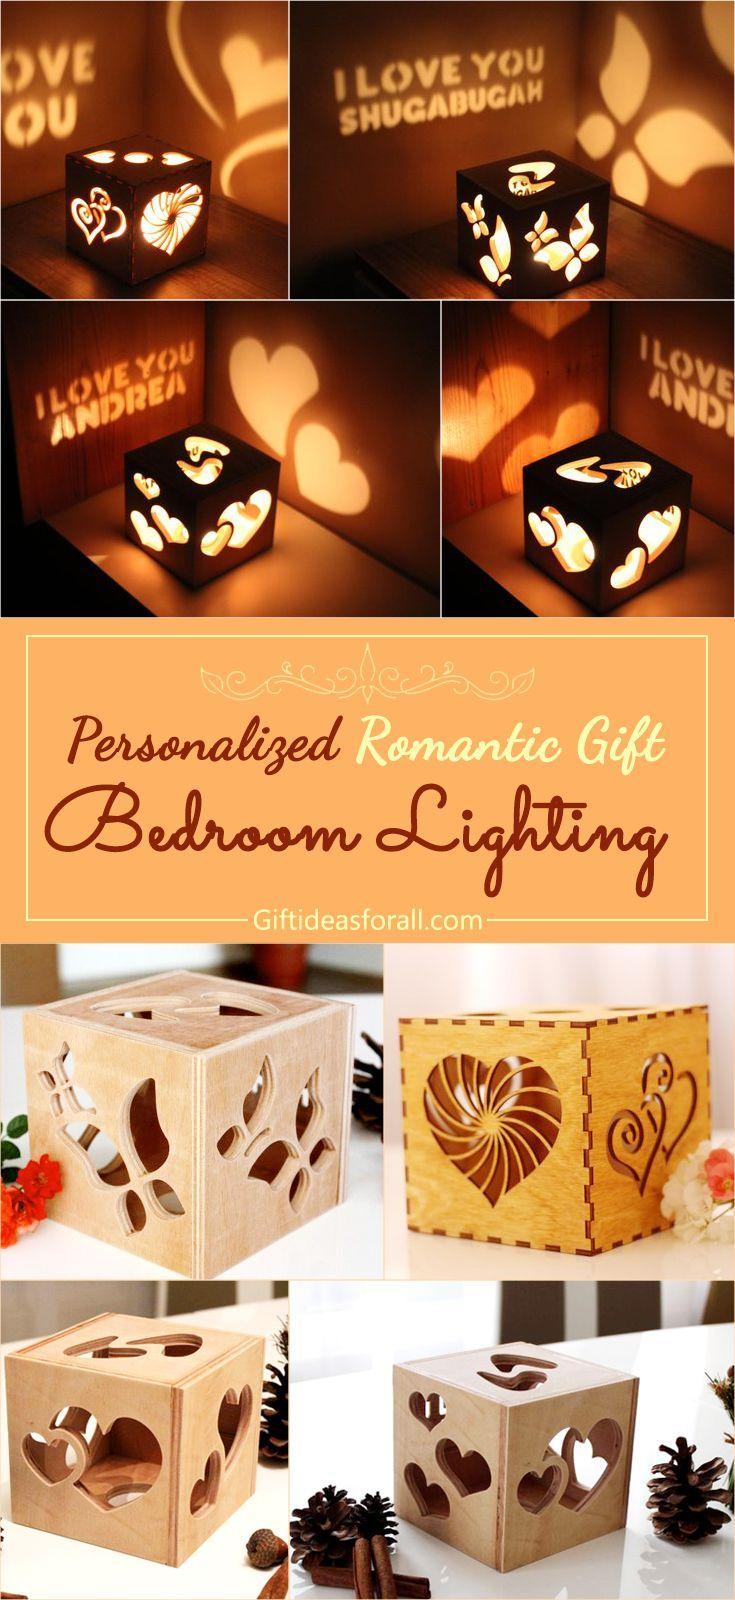 11 Unique Birthday Gift Ideas To Surprise Your Girlfriend Unique